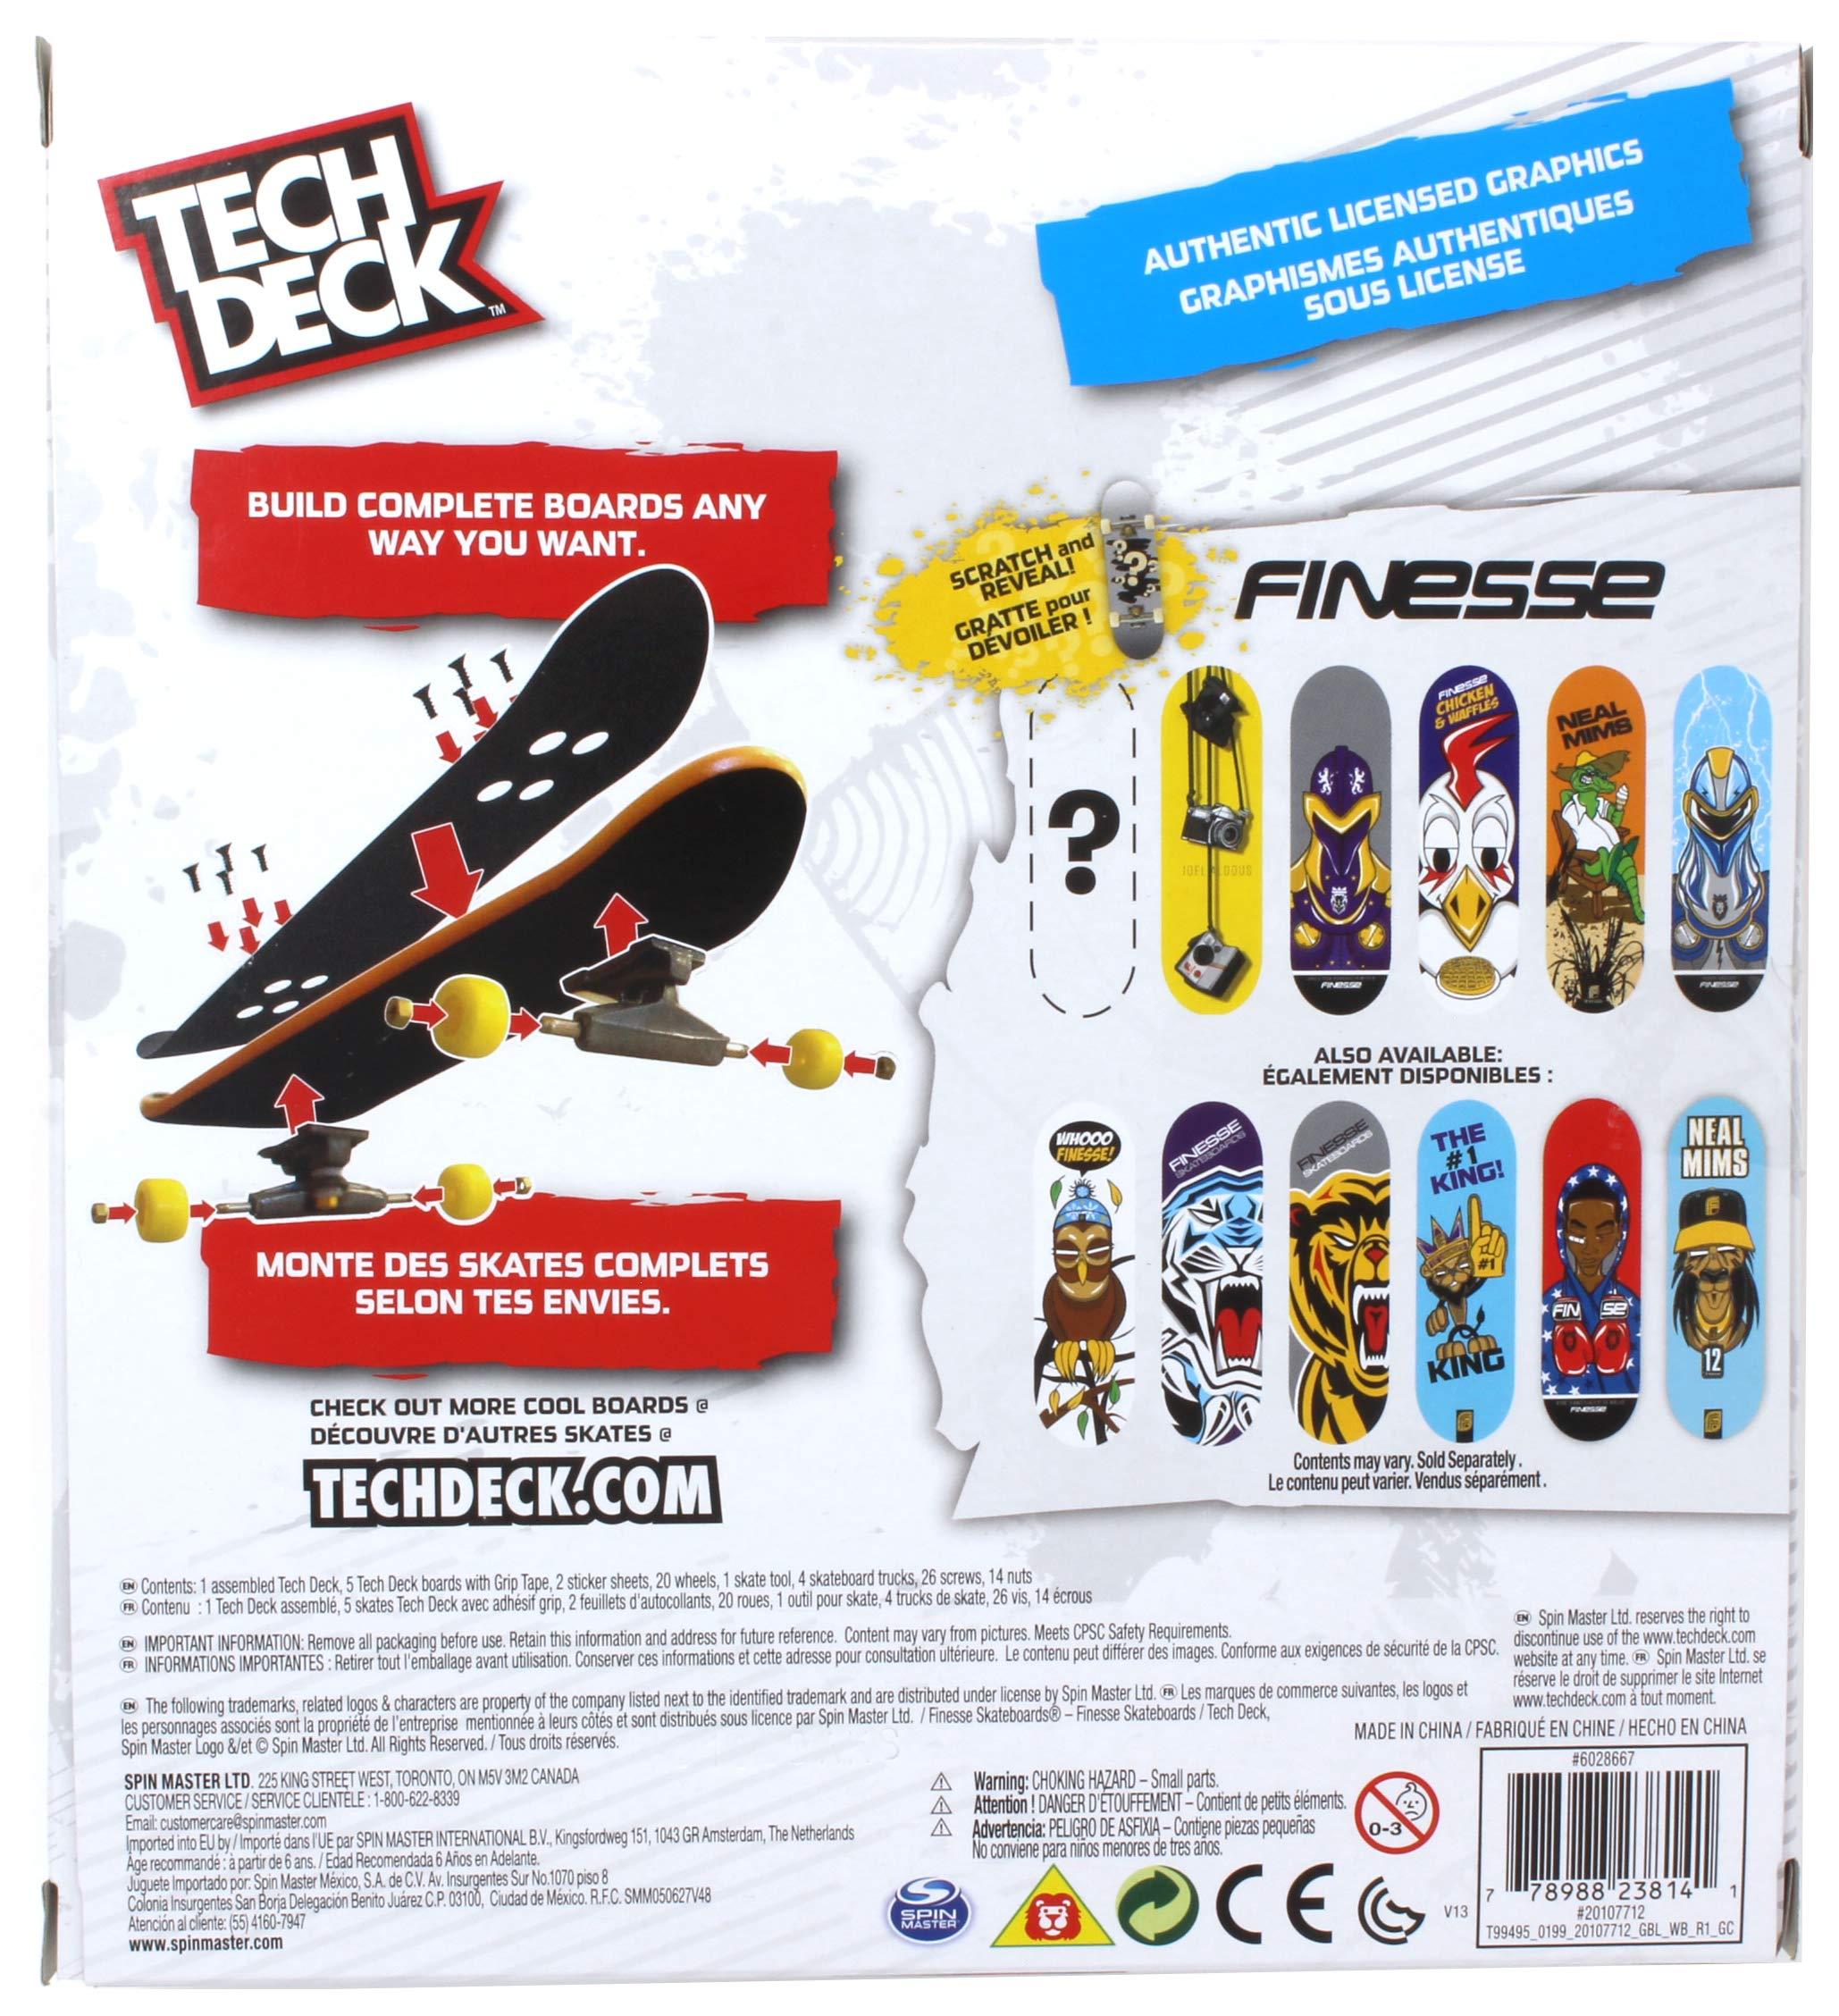 Tech Deck Finesse Skateboards Sk8shop Bonus Pack with 6 Fingerboards by Tech Deck Finesse (Image #2)